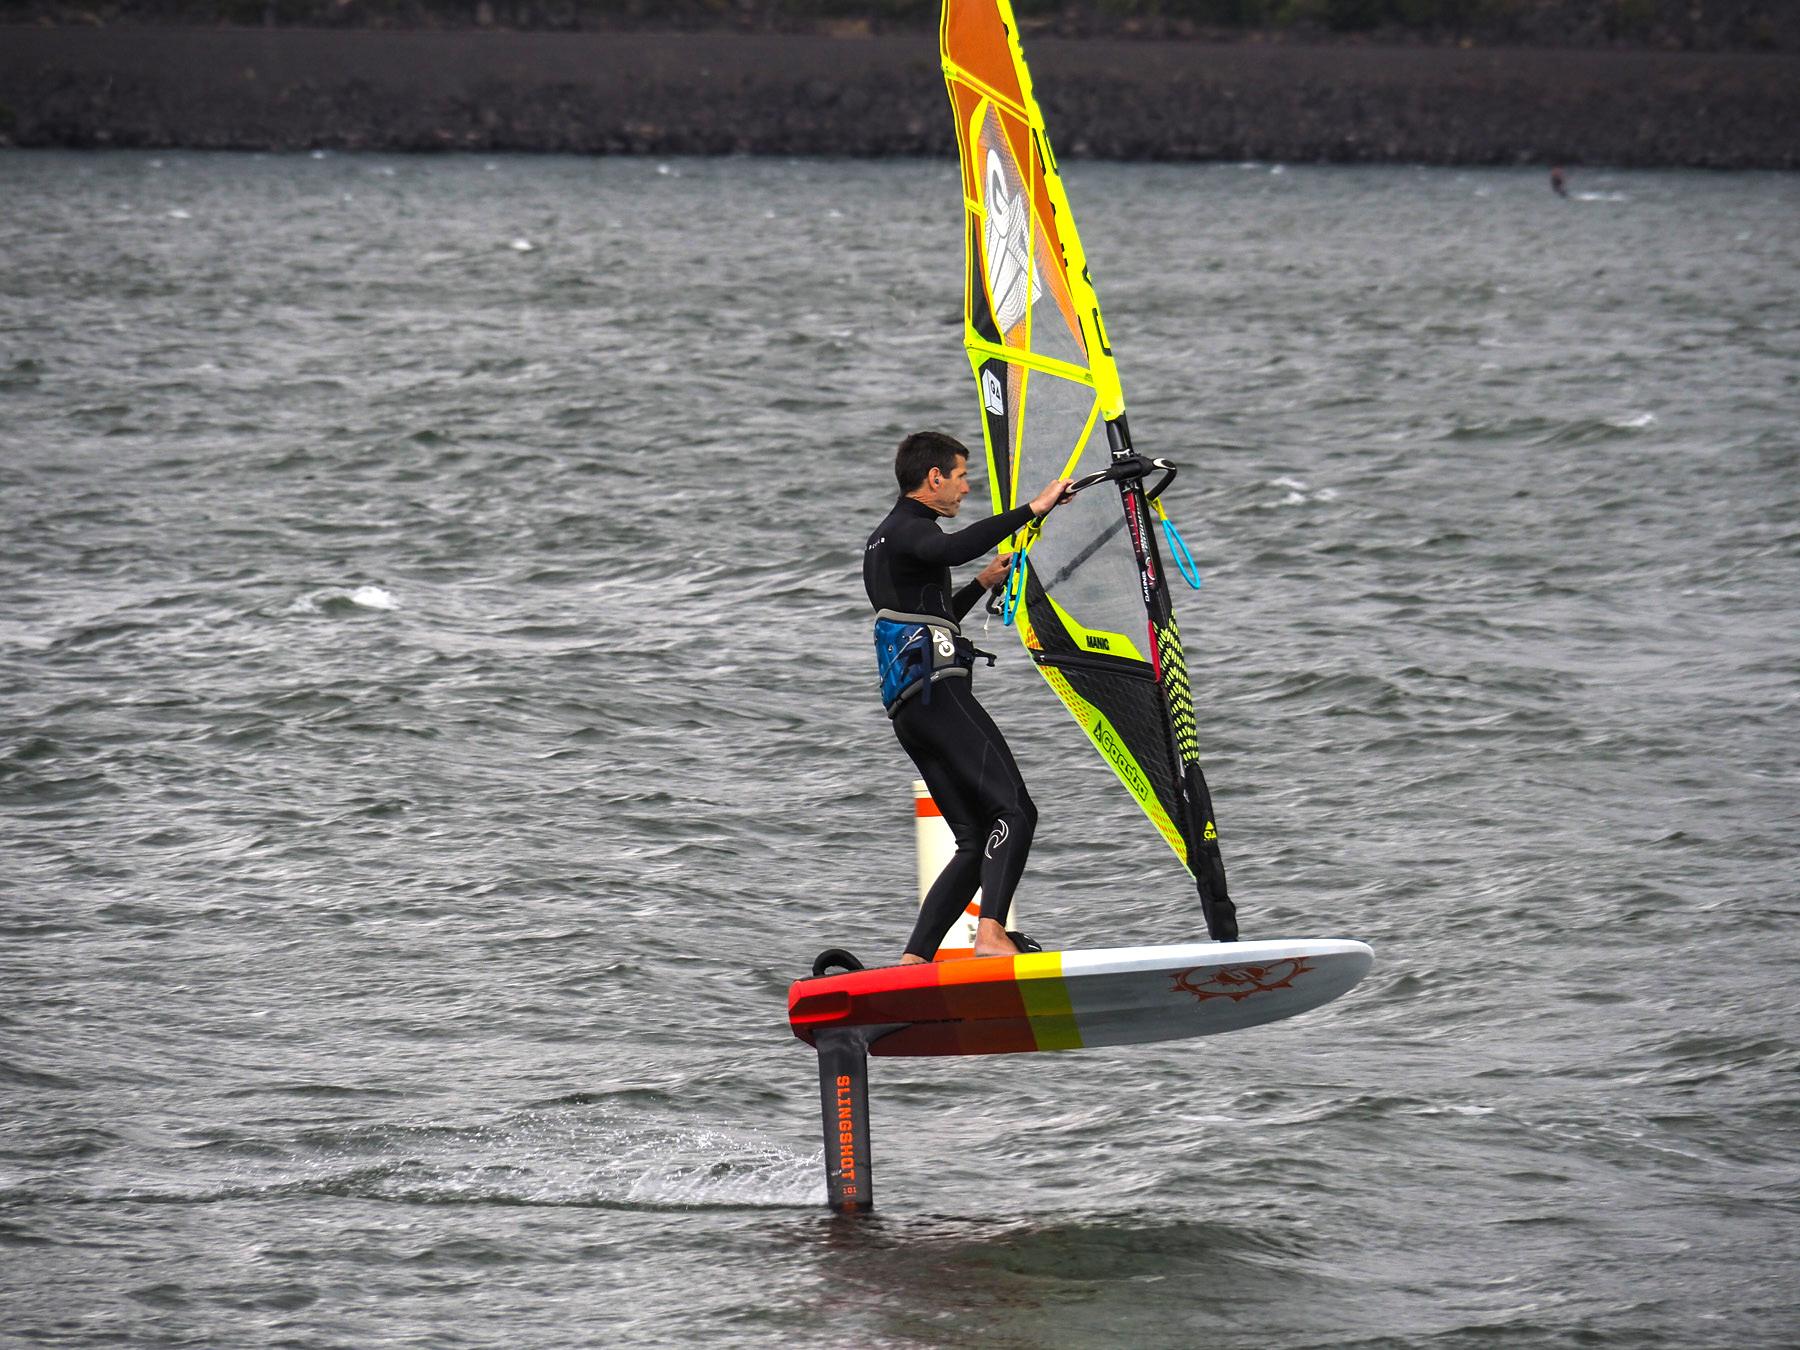 Windsurfer mit Tragflügel